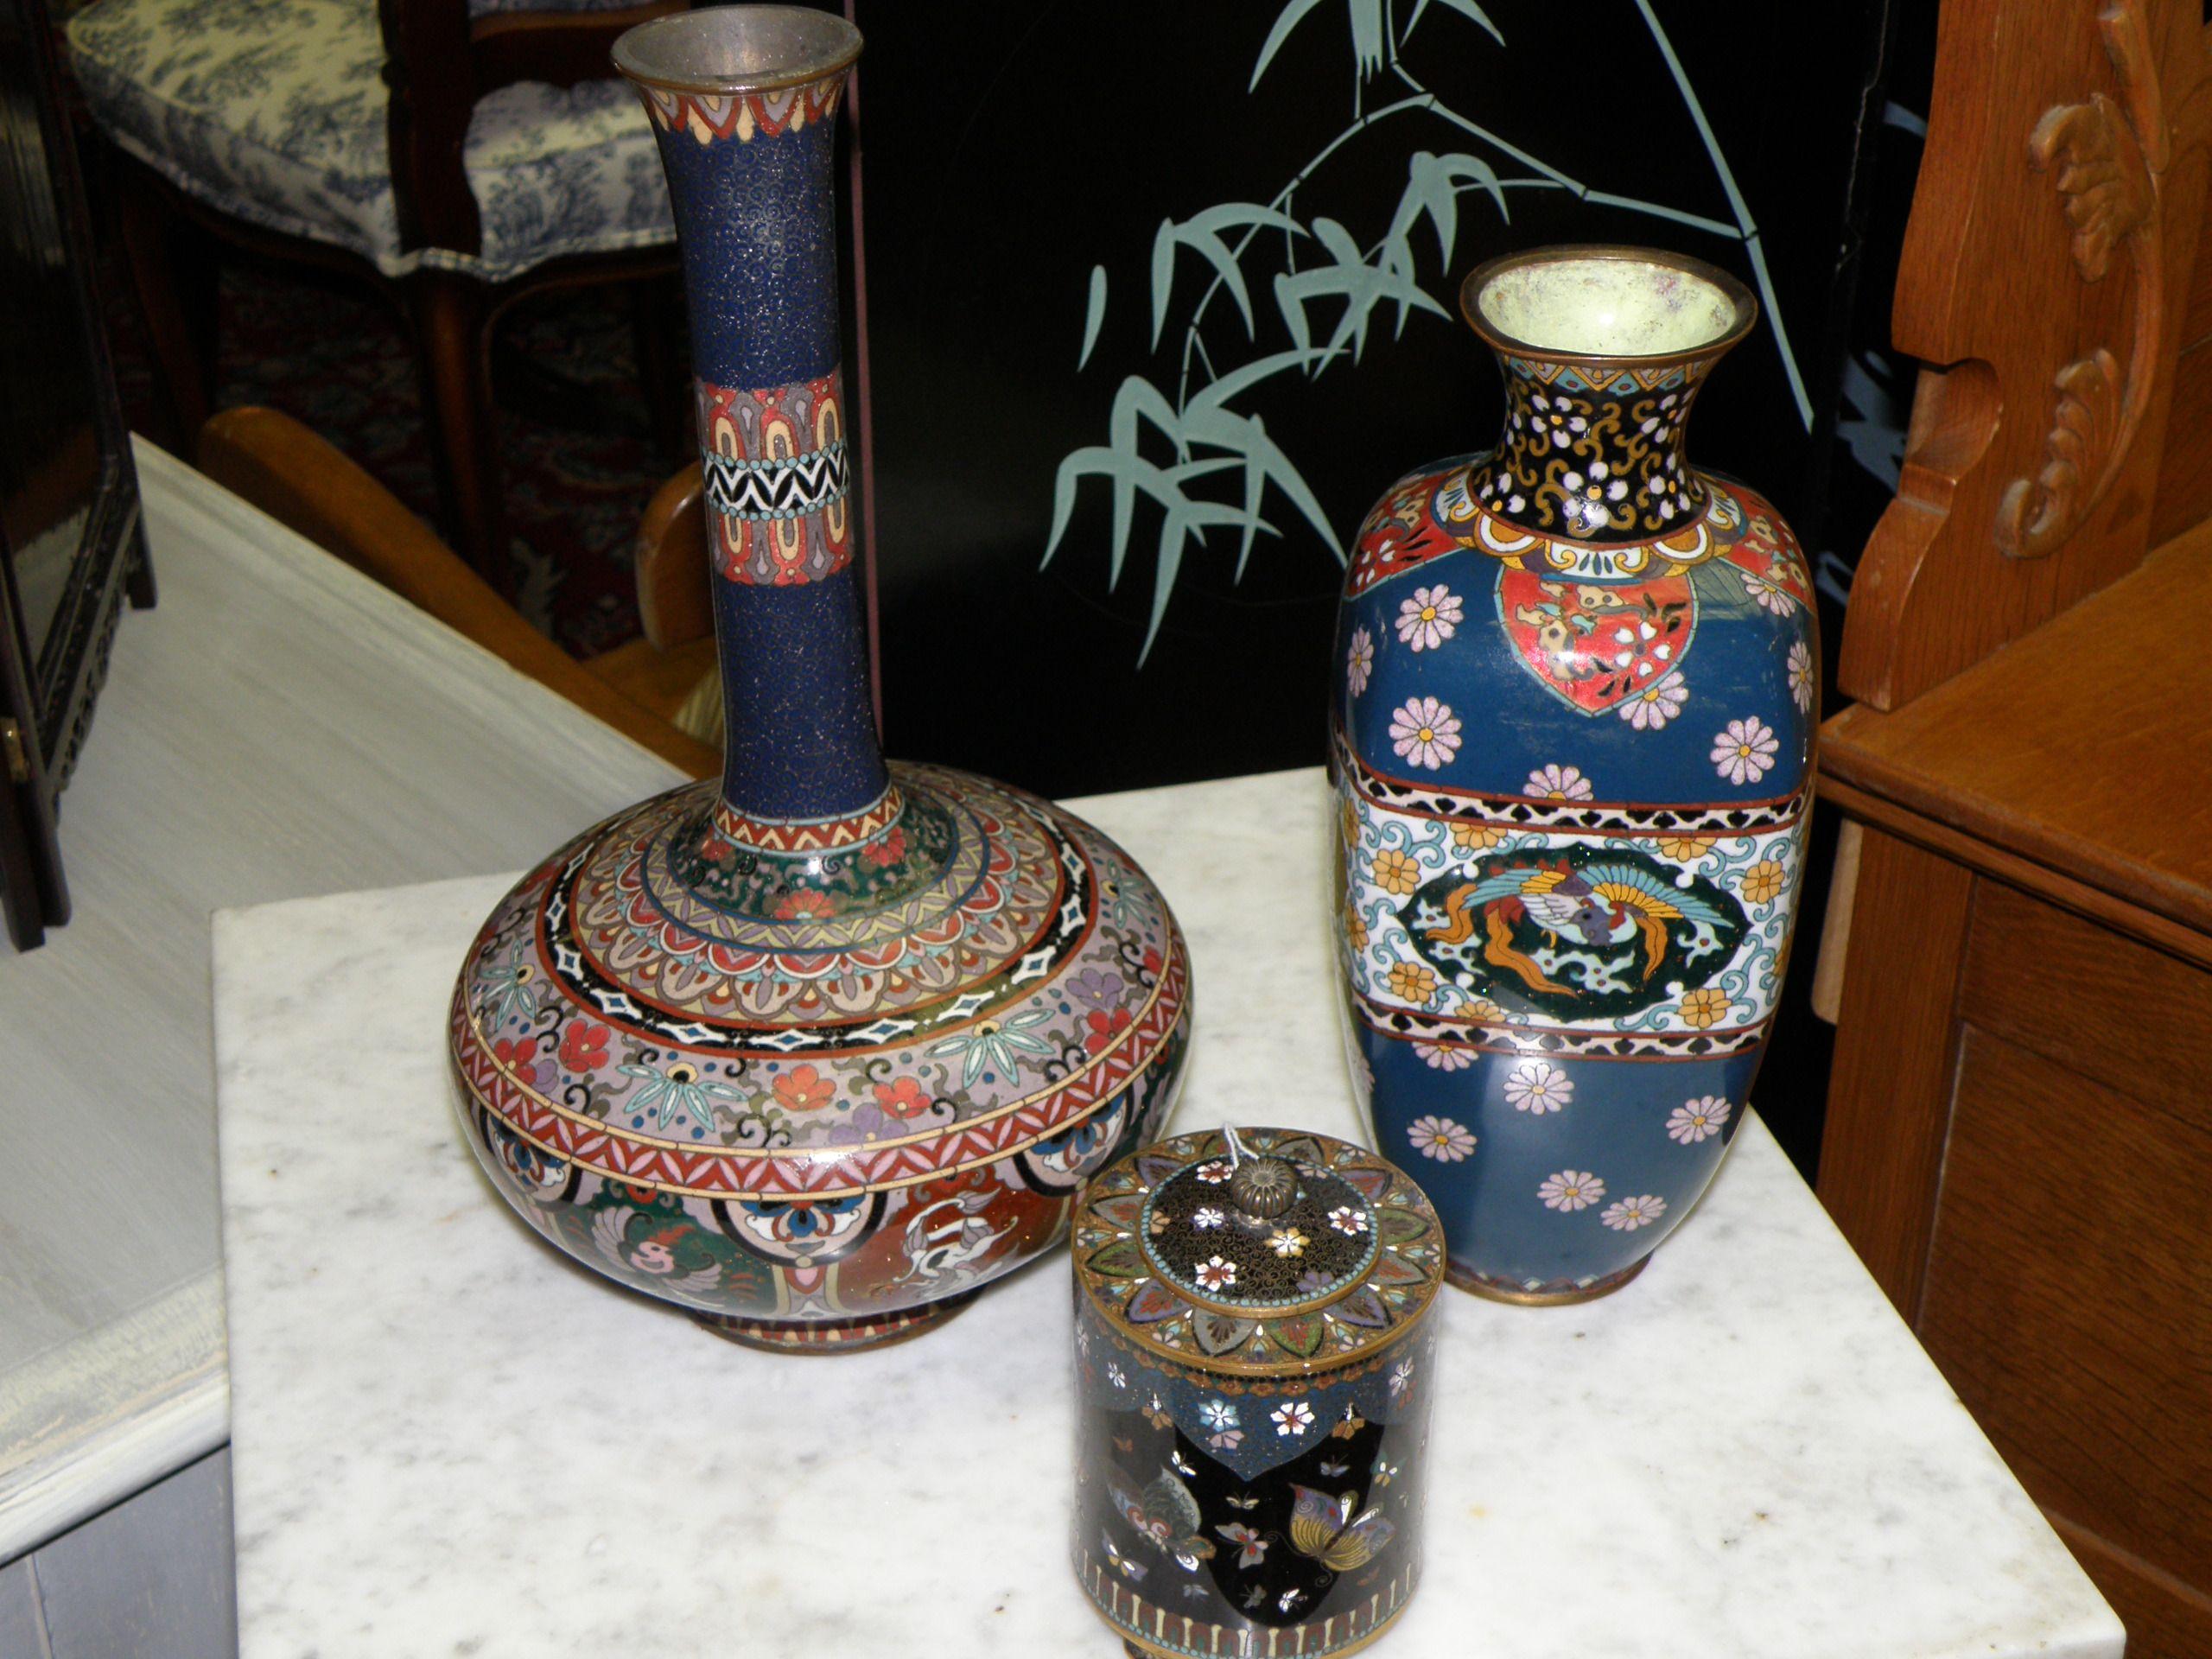 19th c antique japanese vase 19th c japanese covered jar 19th 19th c antique japanese vase 19th c japanese covered jar 19th century cloisonne vase reviewsmspy